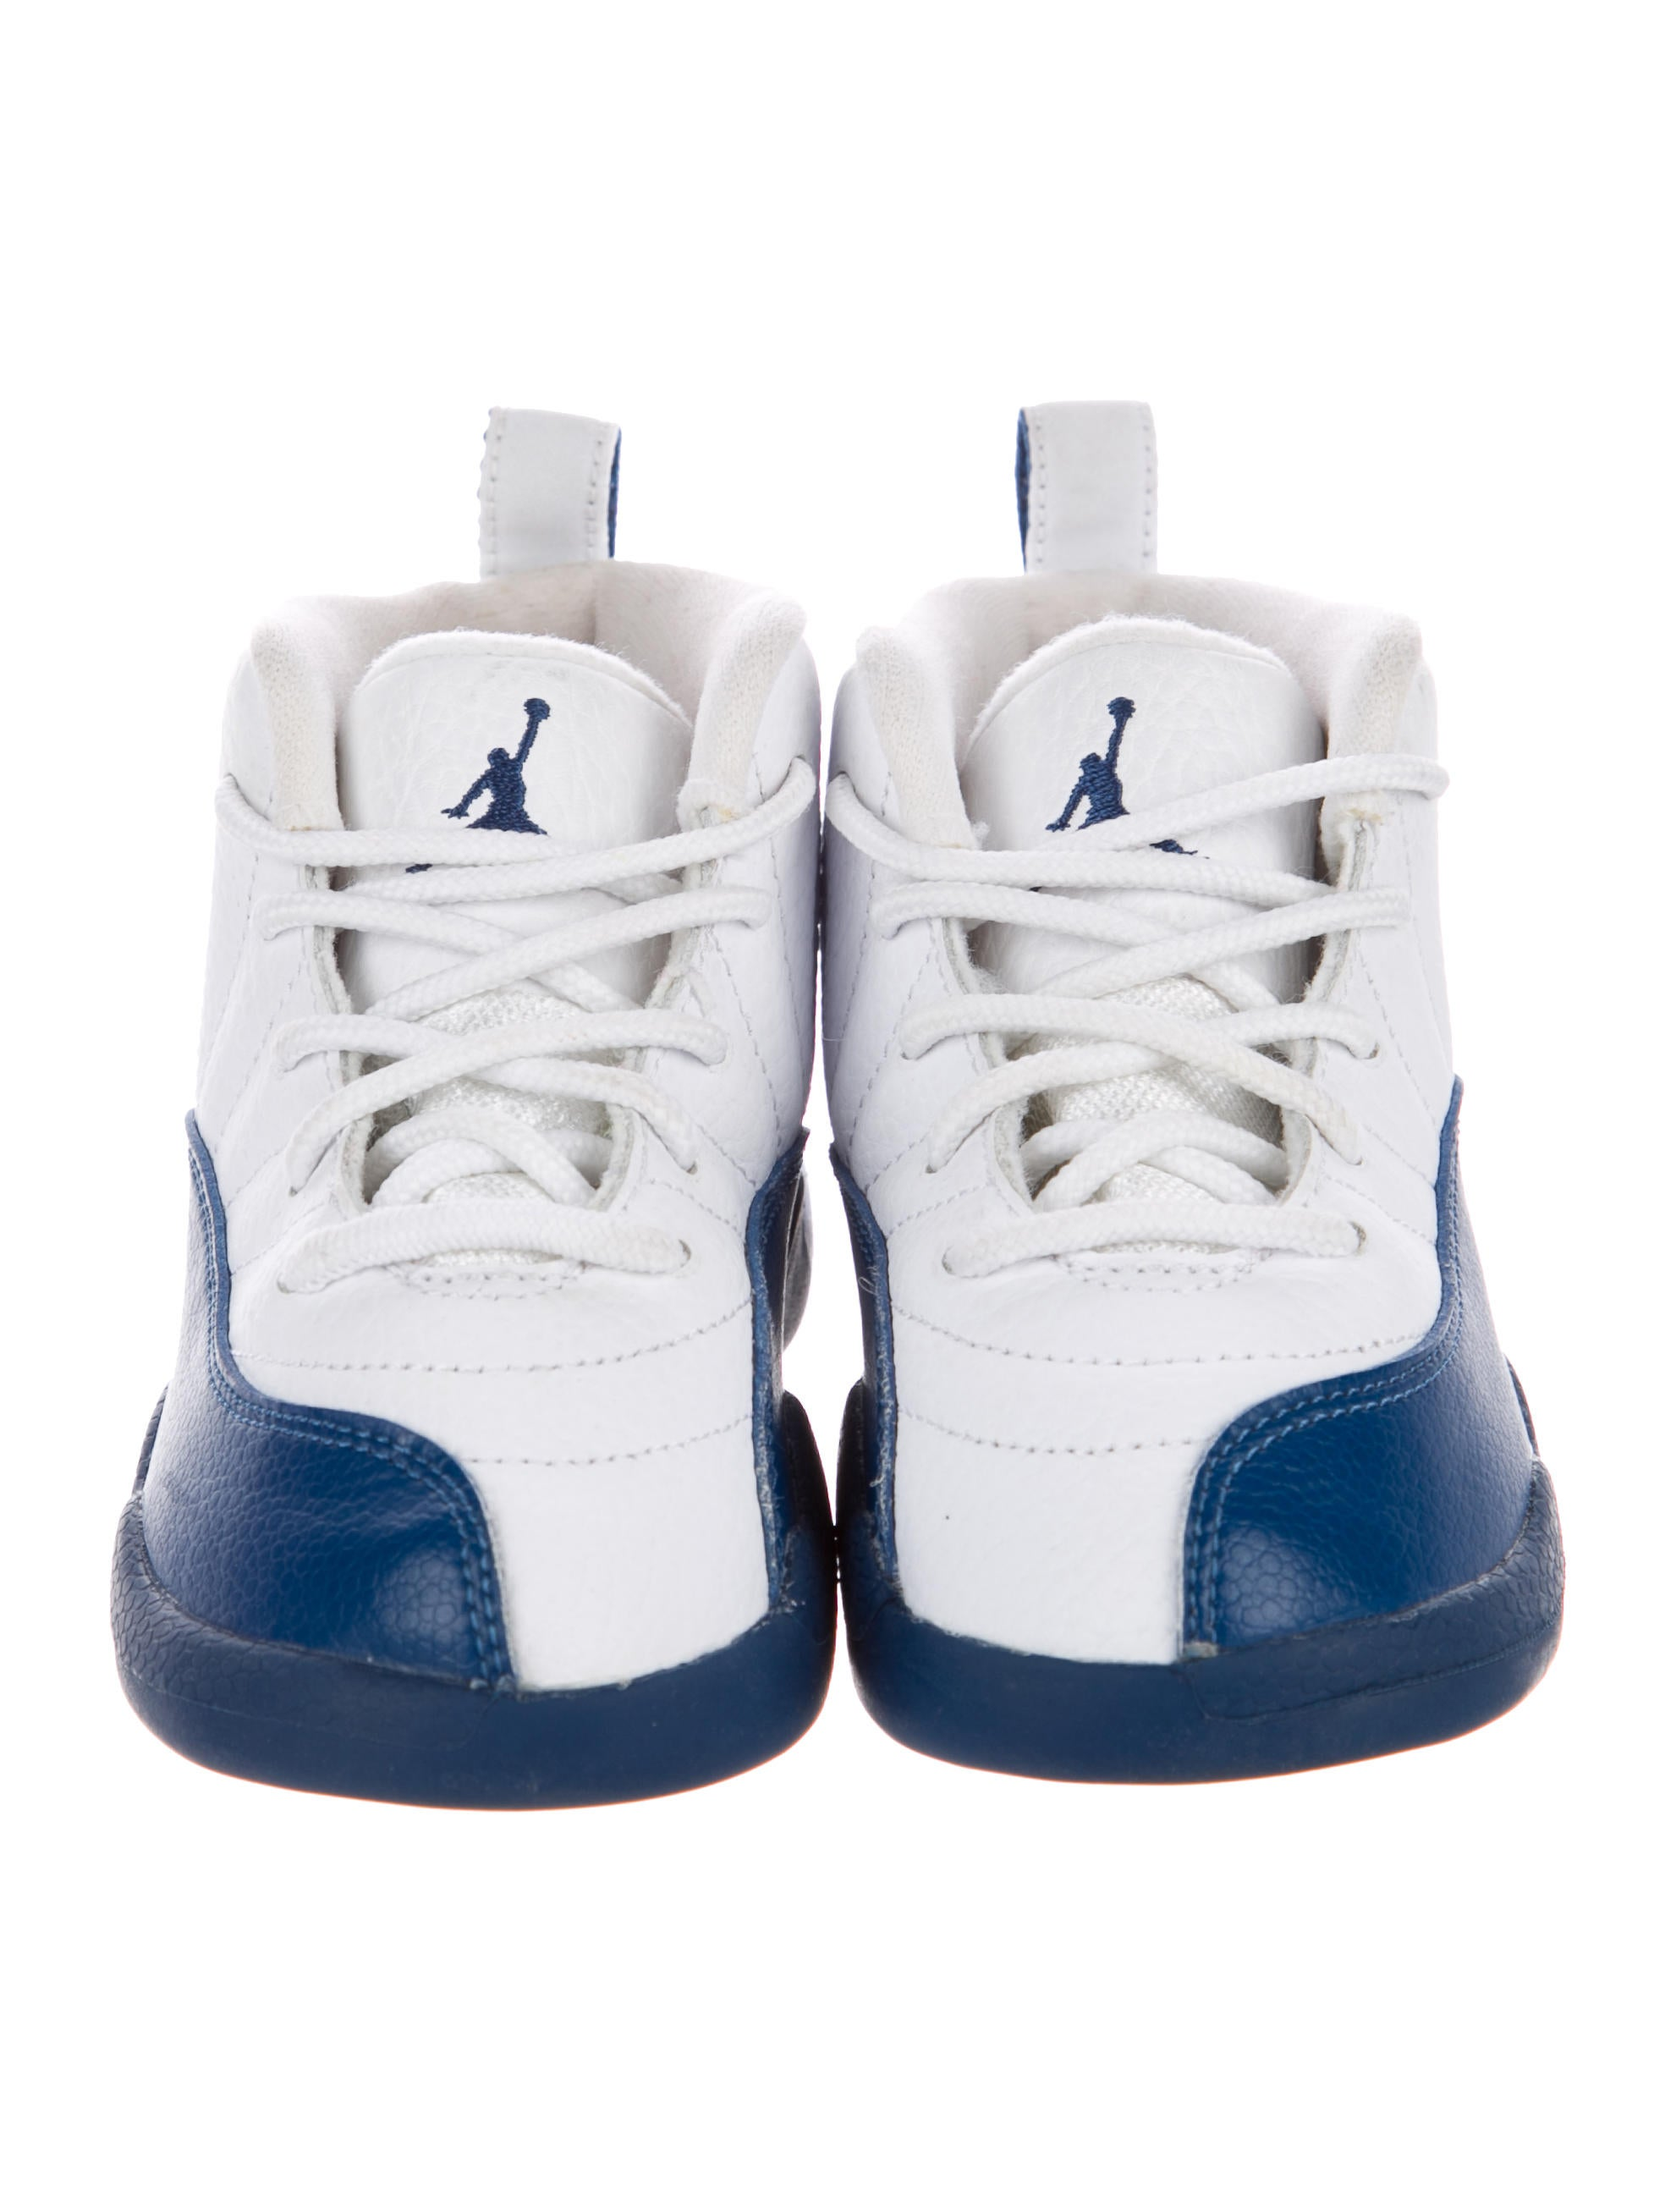 buy online 72a3b 3db35 Nike Air Jordan Boys' Jordan 12 Retro BT Sneakers